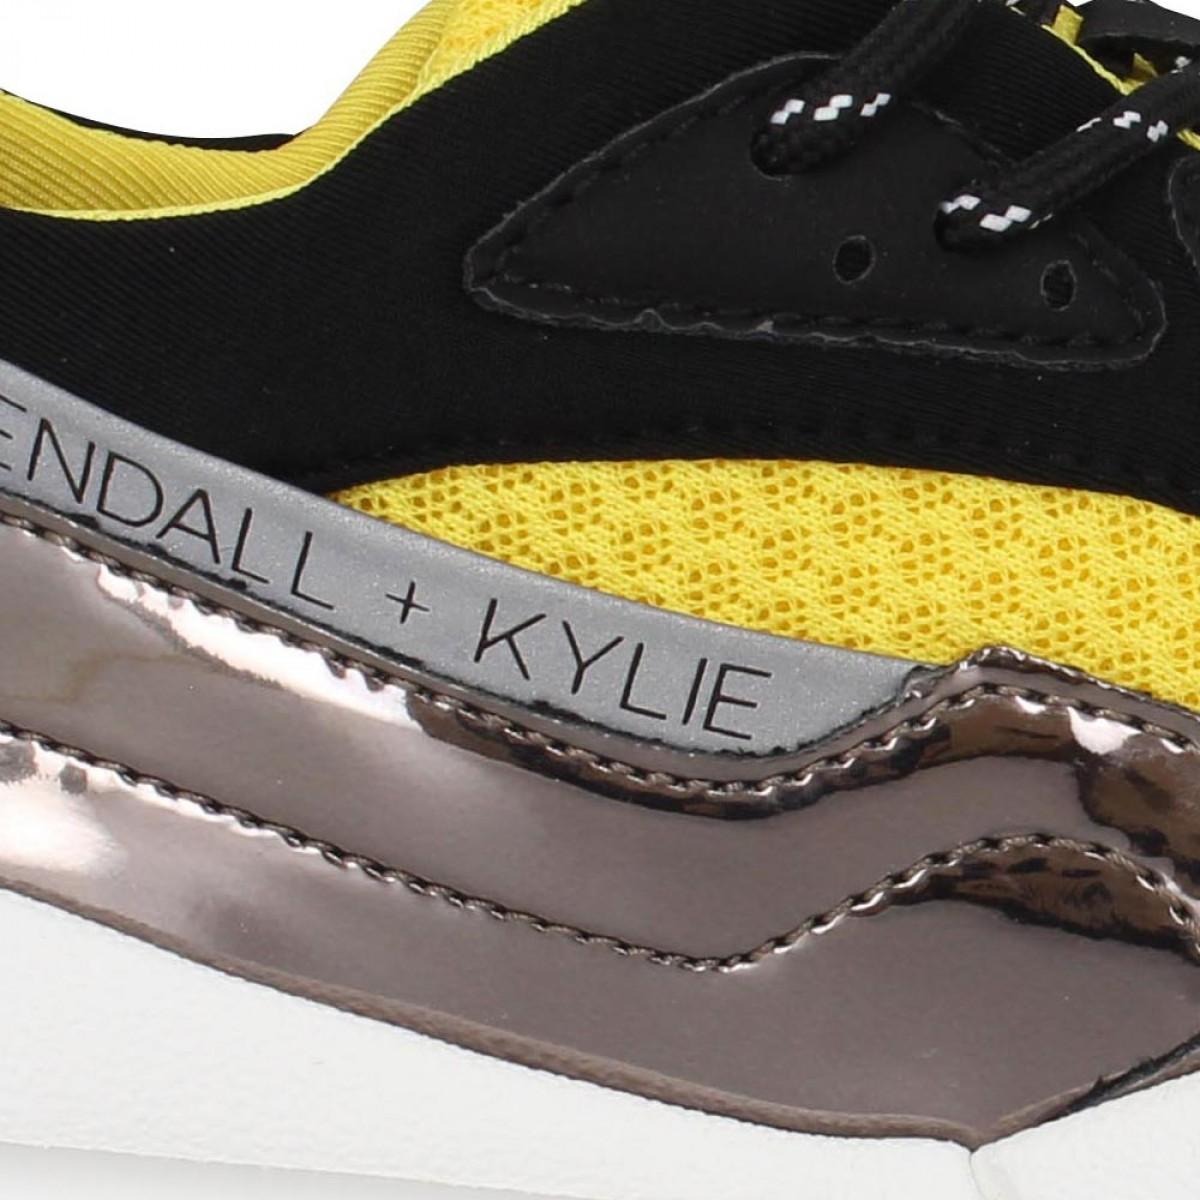 KENDALL + KYLIE Nikki toile Femme Noir Jaune